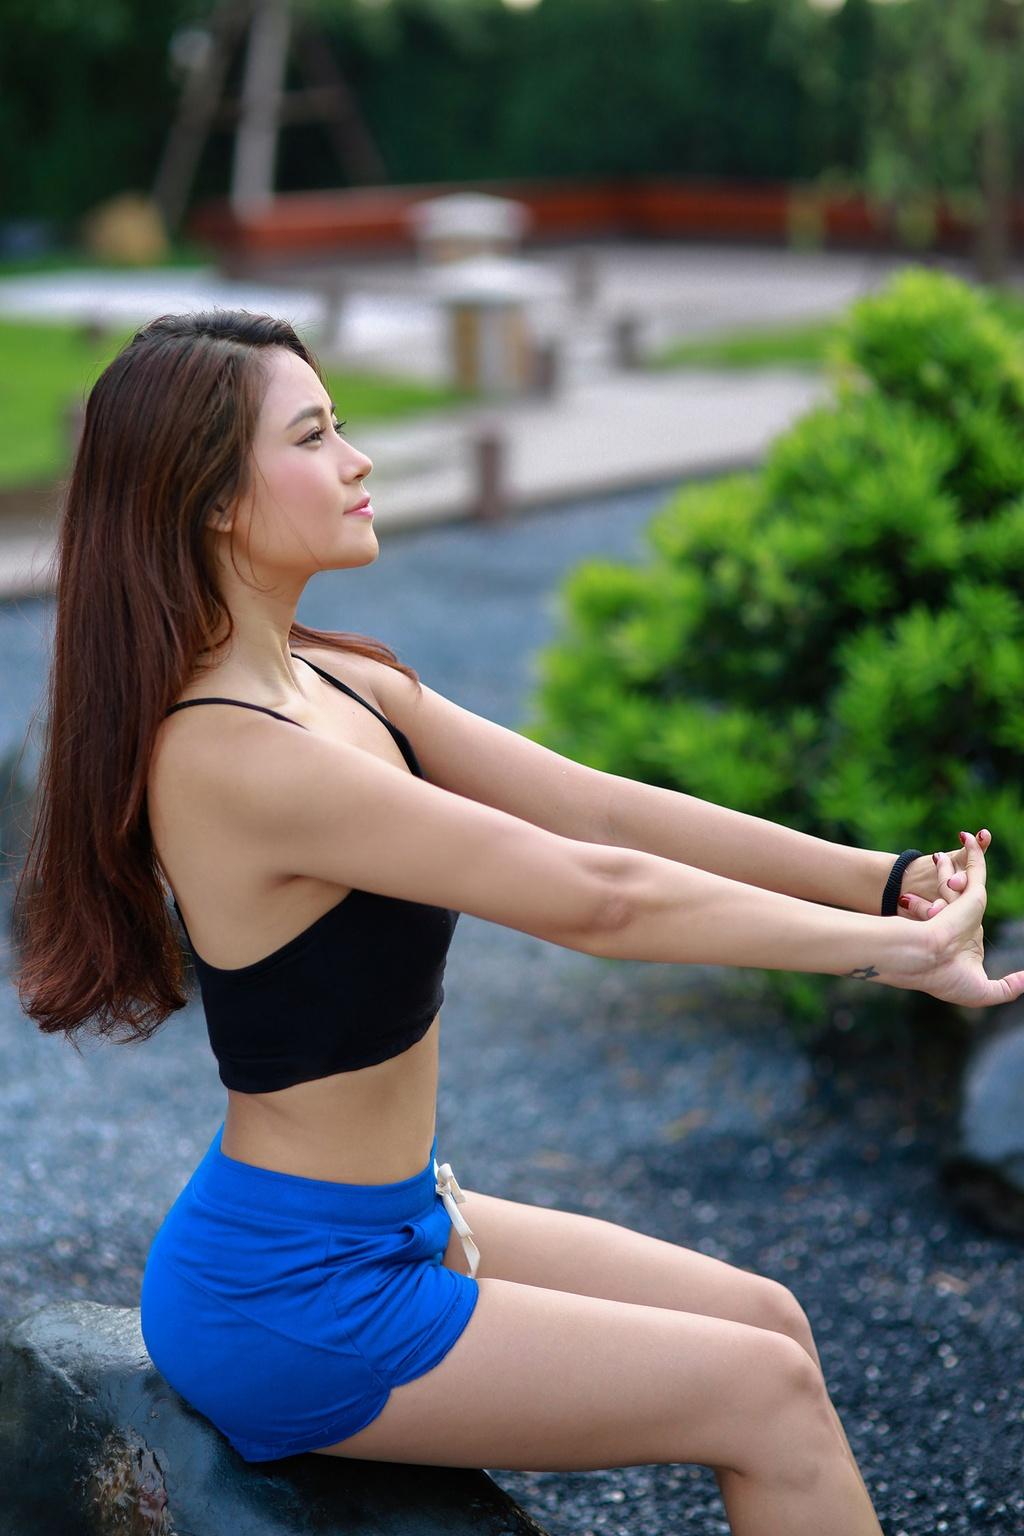 So huu 3 vong nong bong voi yoga cung Van Anh hinh anh 1